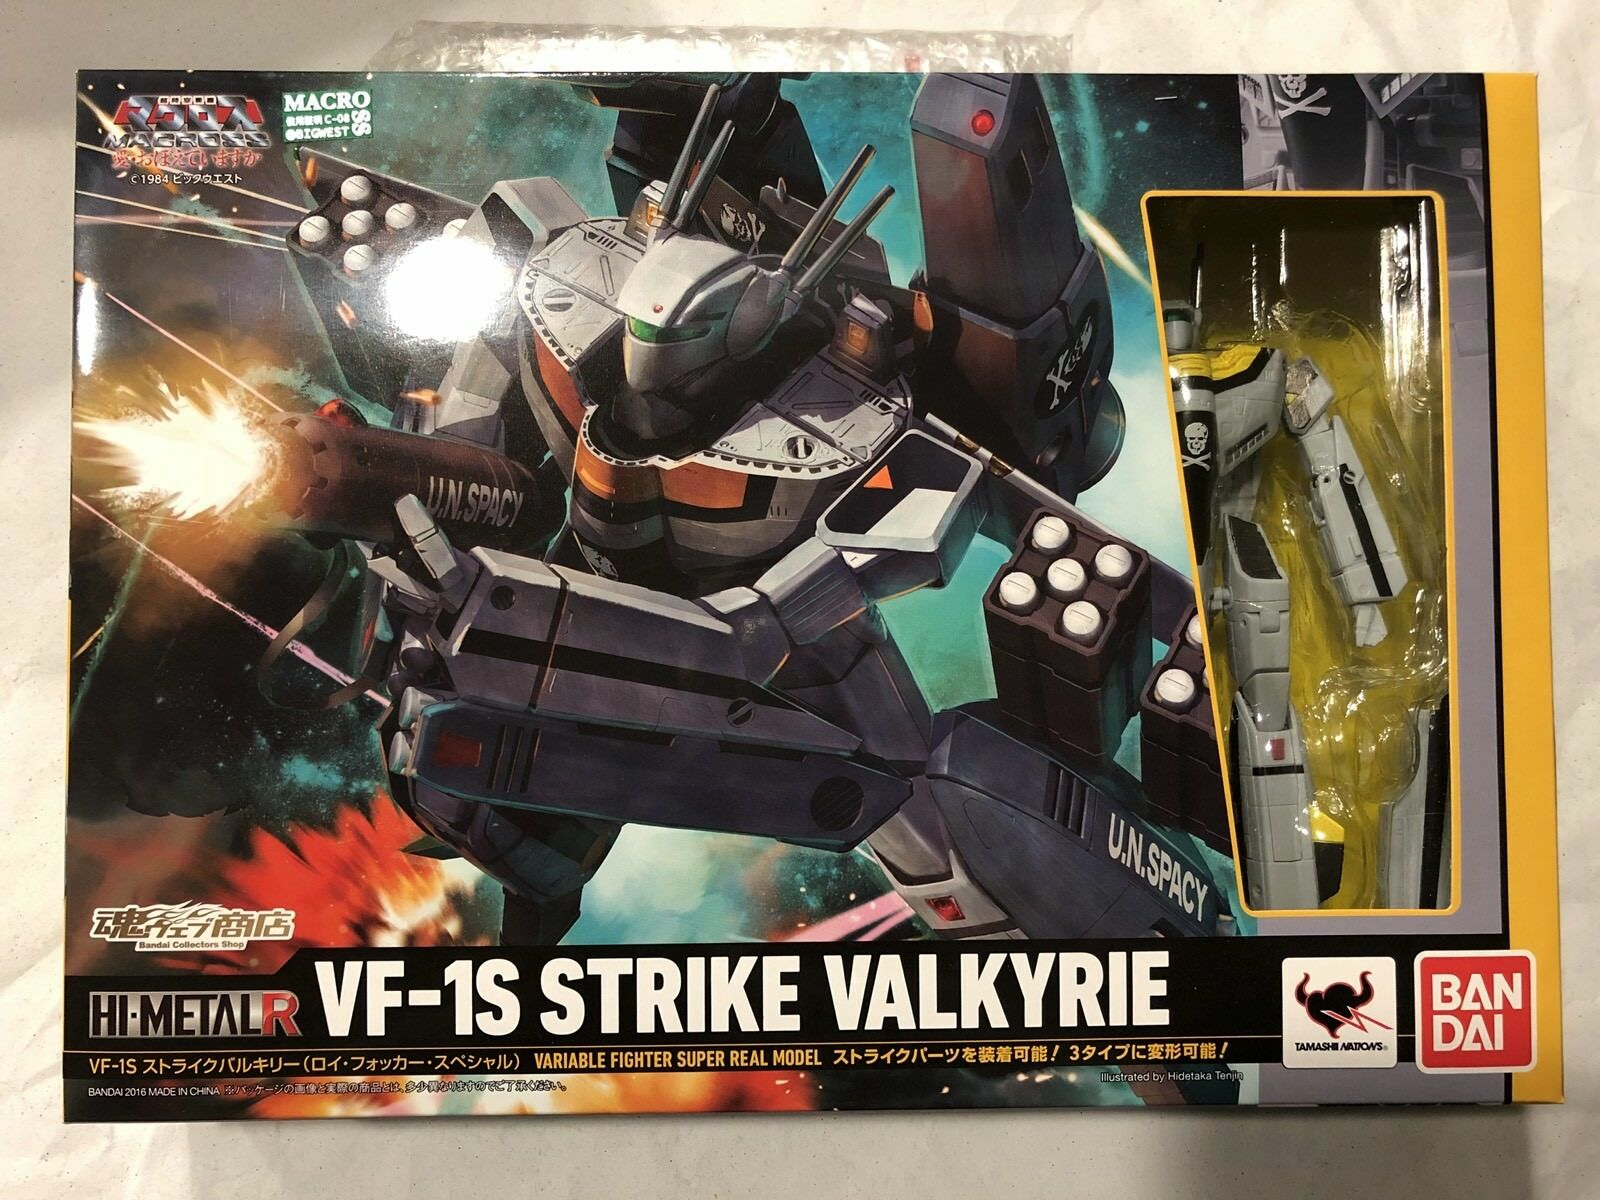 Macross Hi-metal R VF-1S Strike Valkyrie Roy Focker con soporte Dyrl